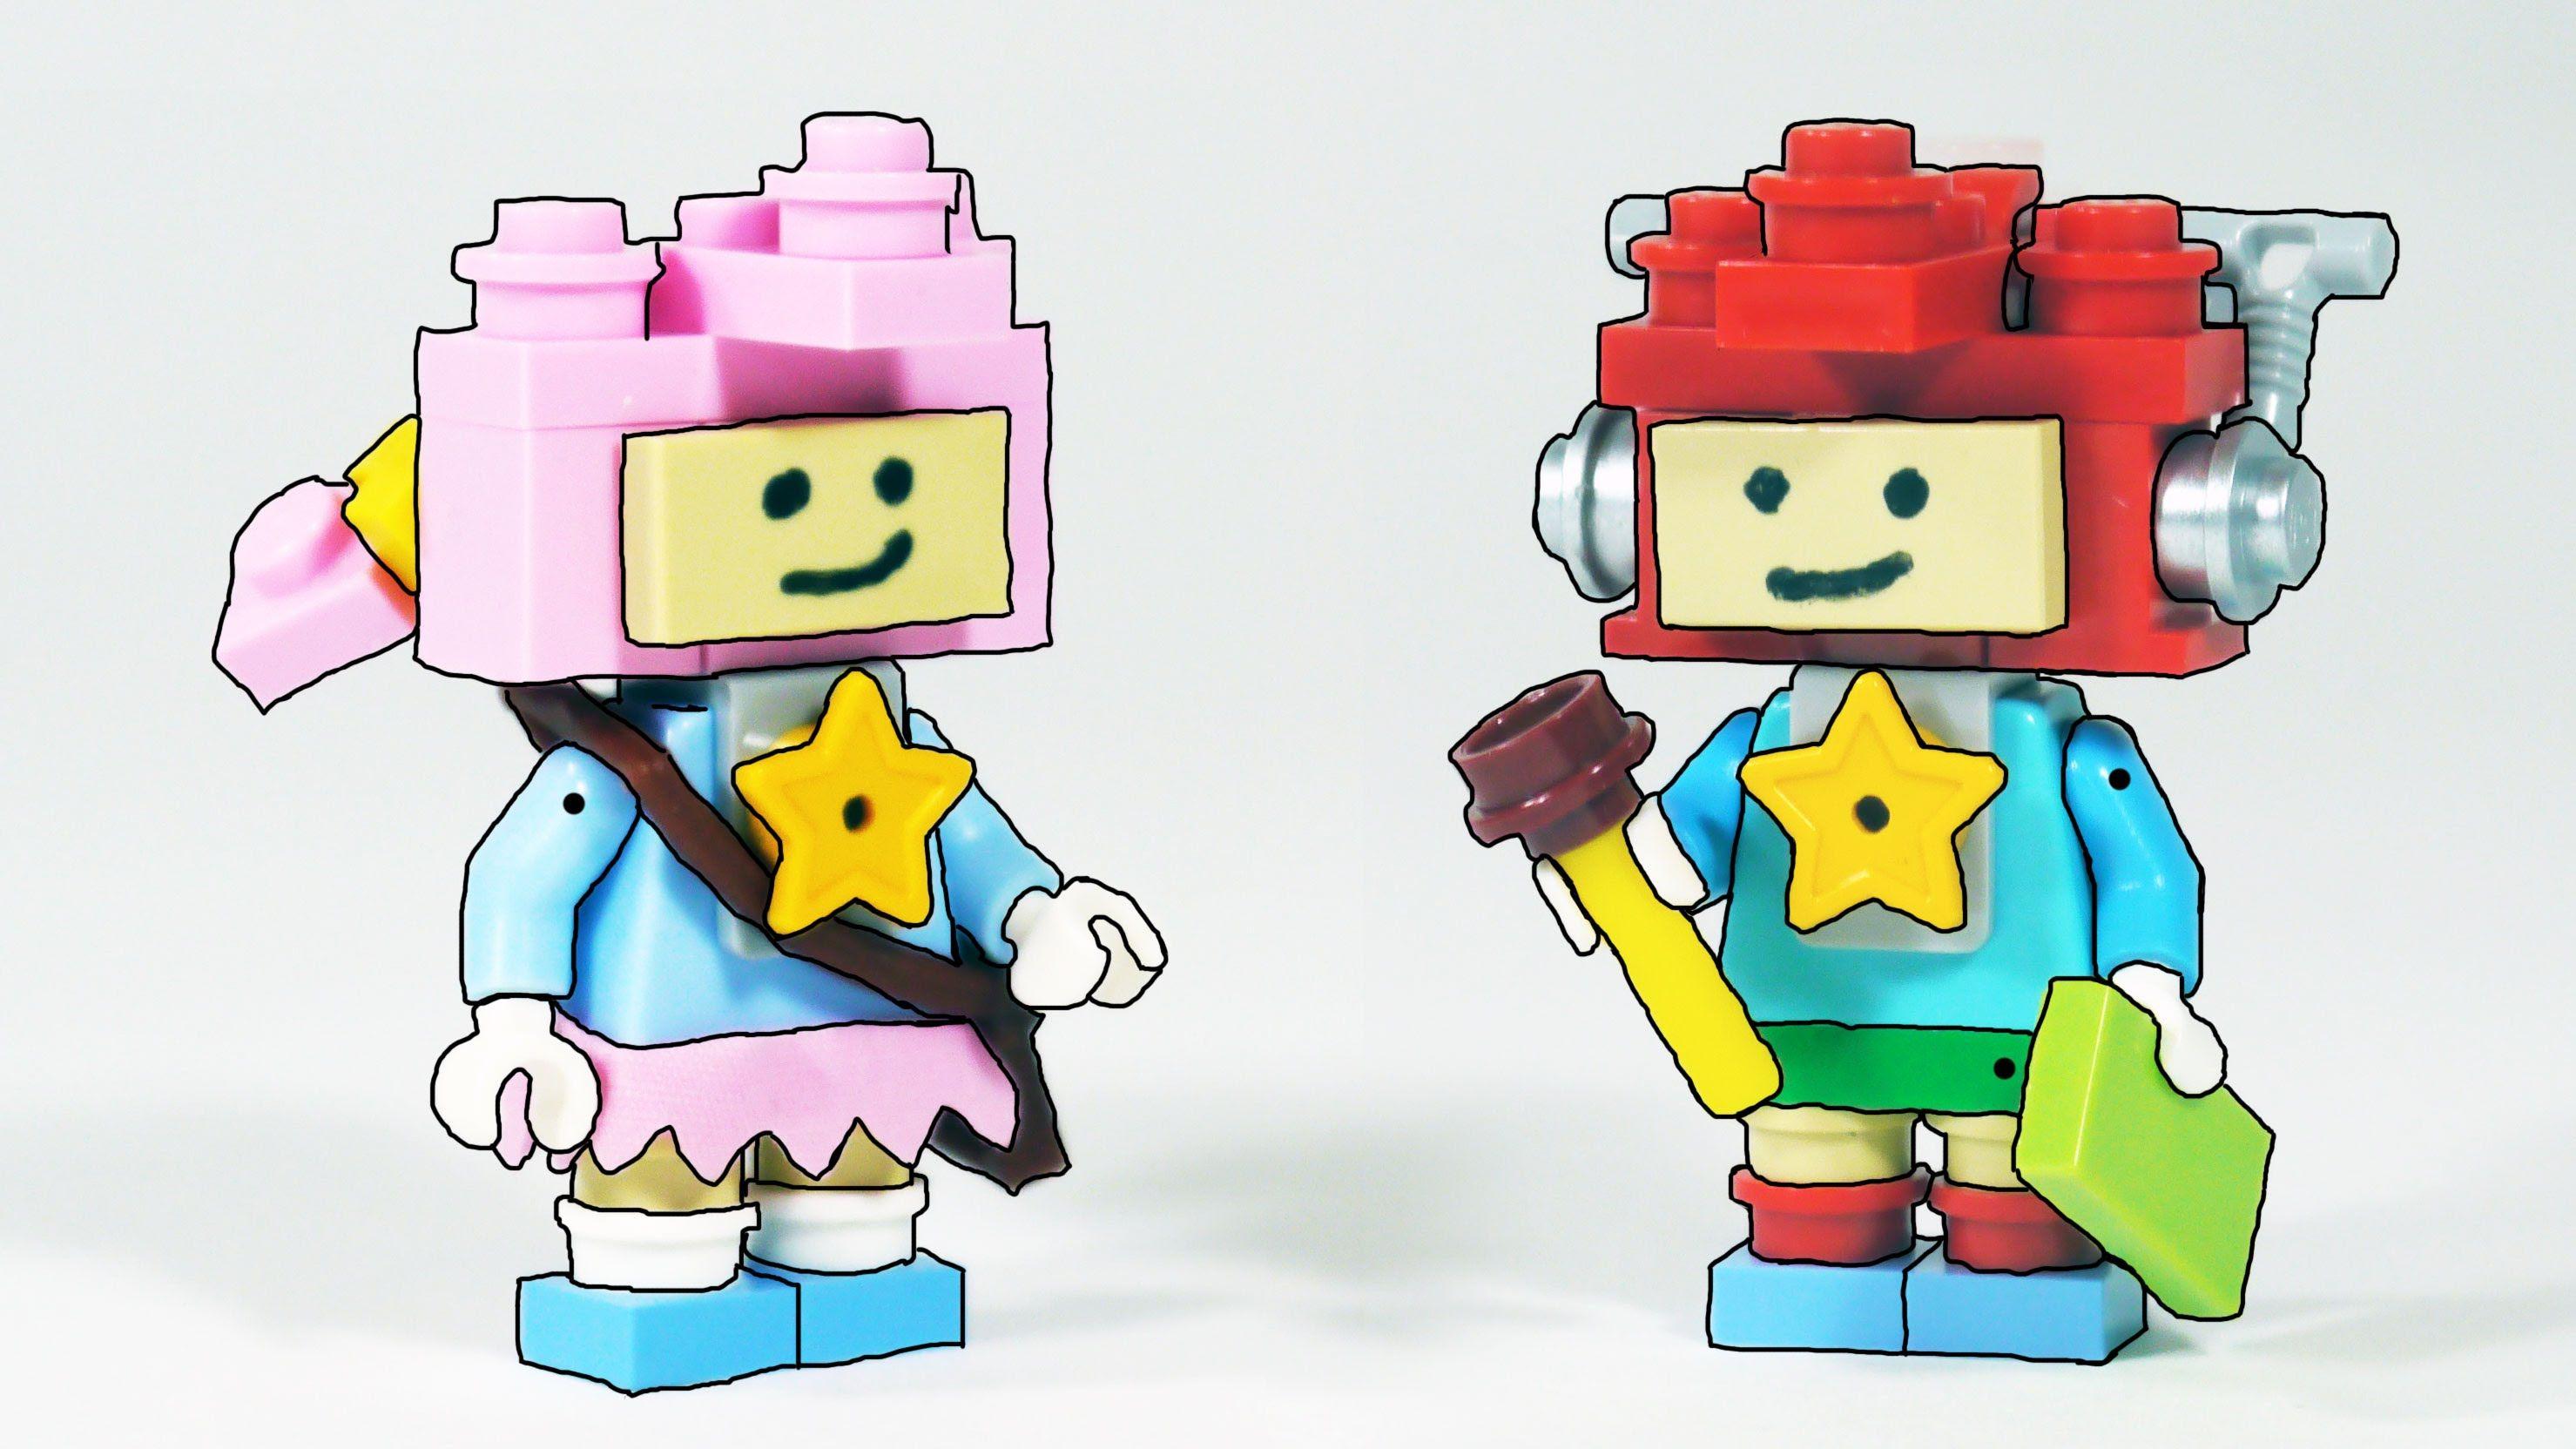 Sans Skeleton Brother Building Kit by AbbieDabbles /& Brick101 using LEGO bricks